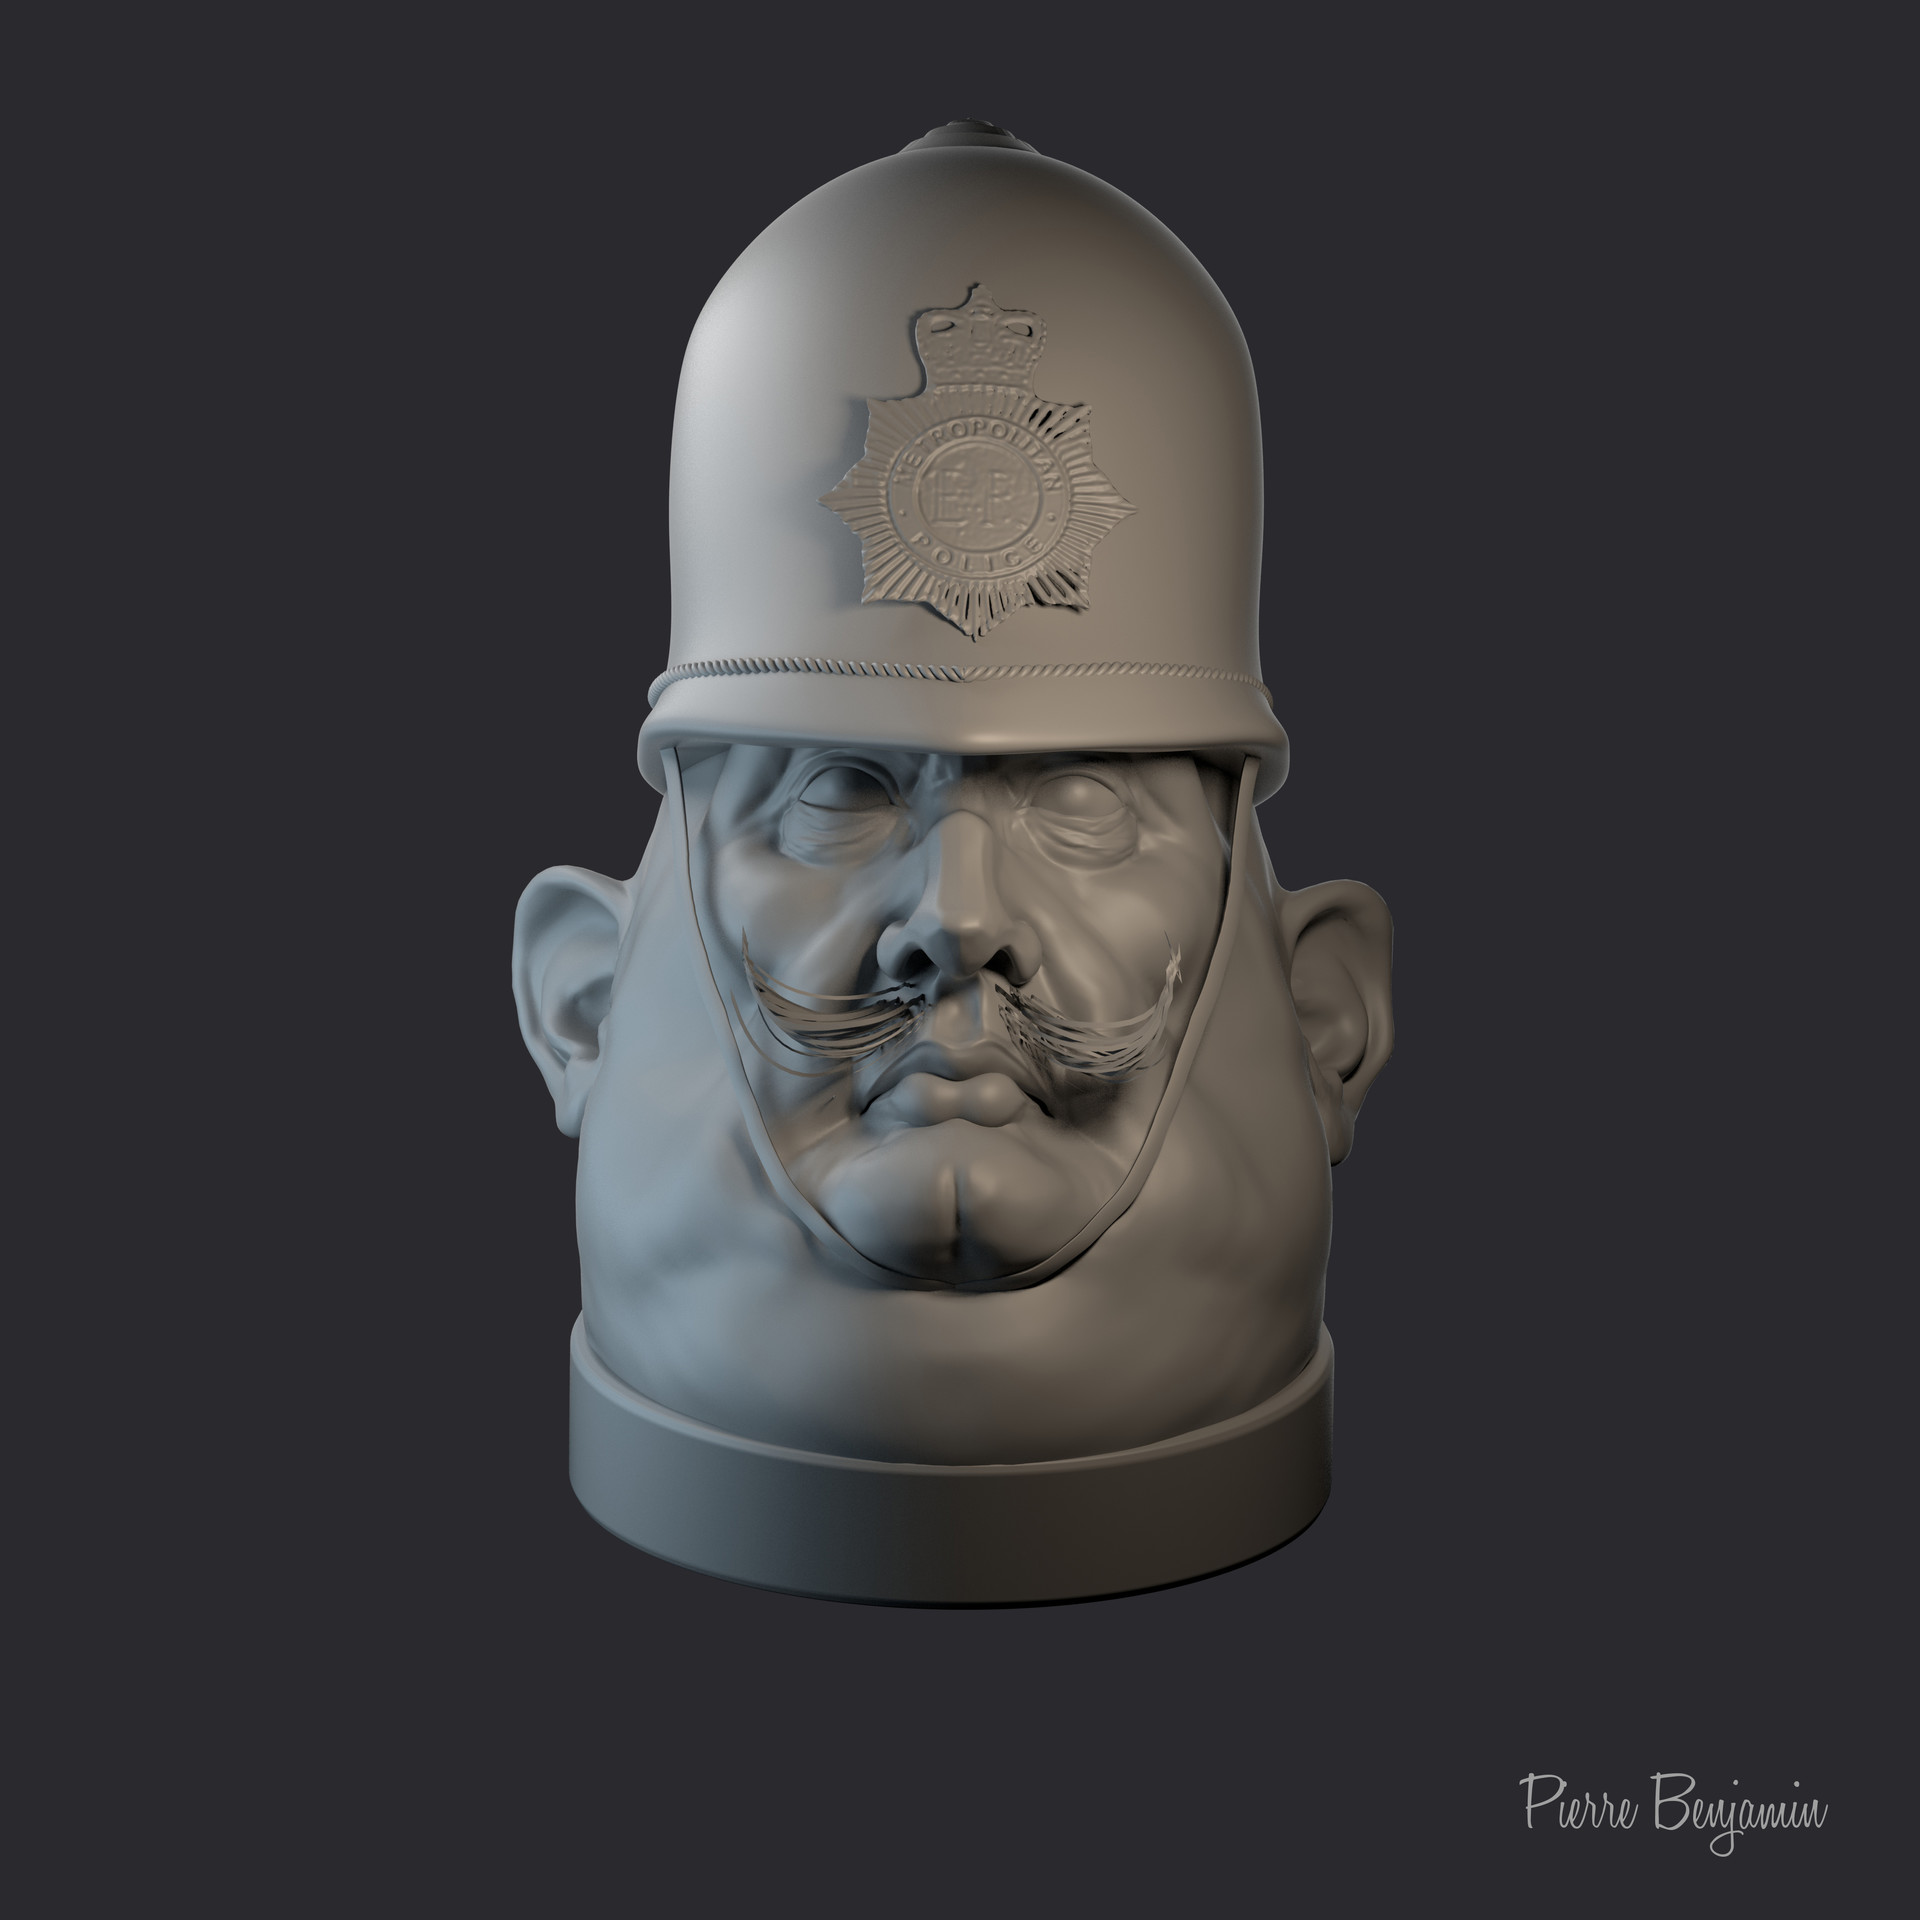 Pierre benjamin copper render from 004aasasa